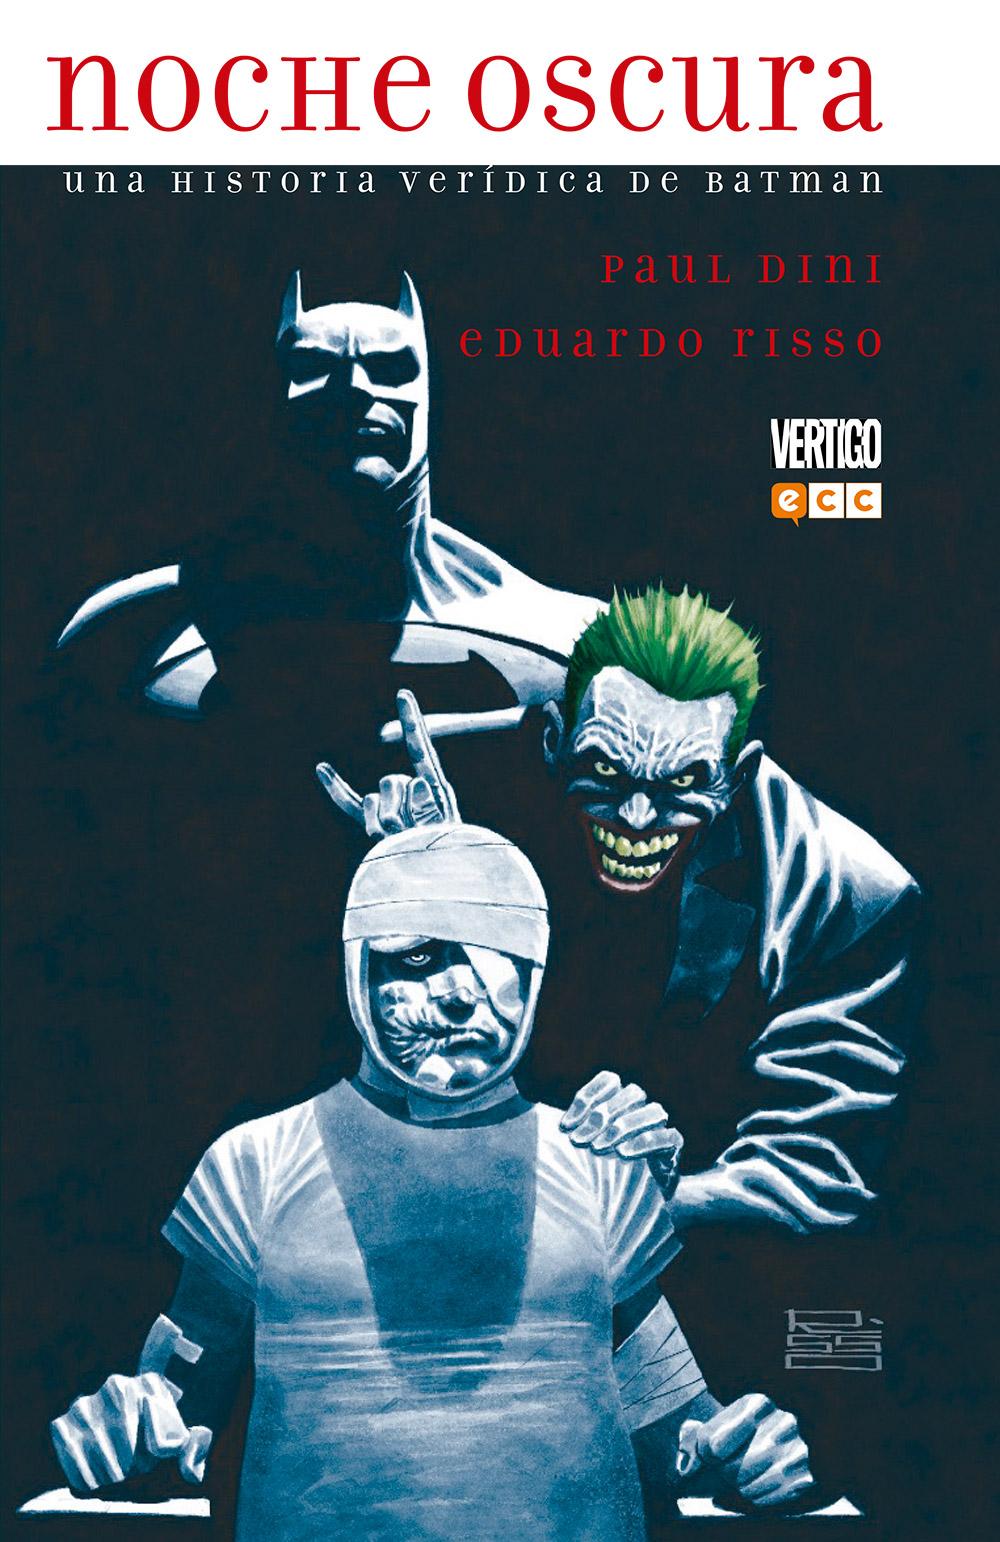 [Comics] Siguen las adquisiciones 2017 - Página 6 Noche_Oscura